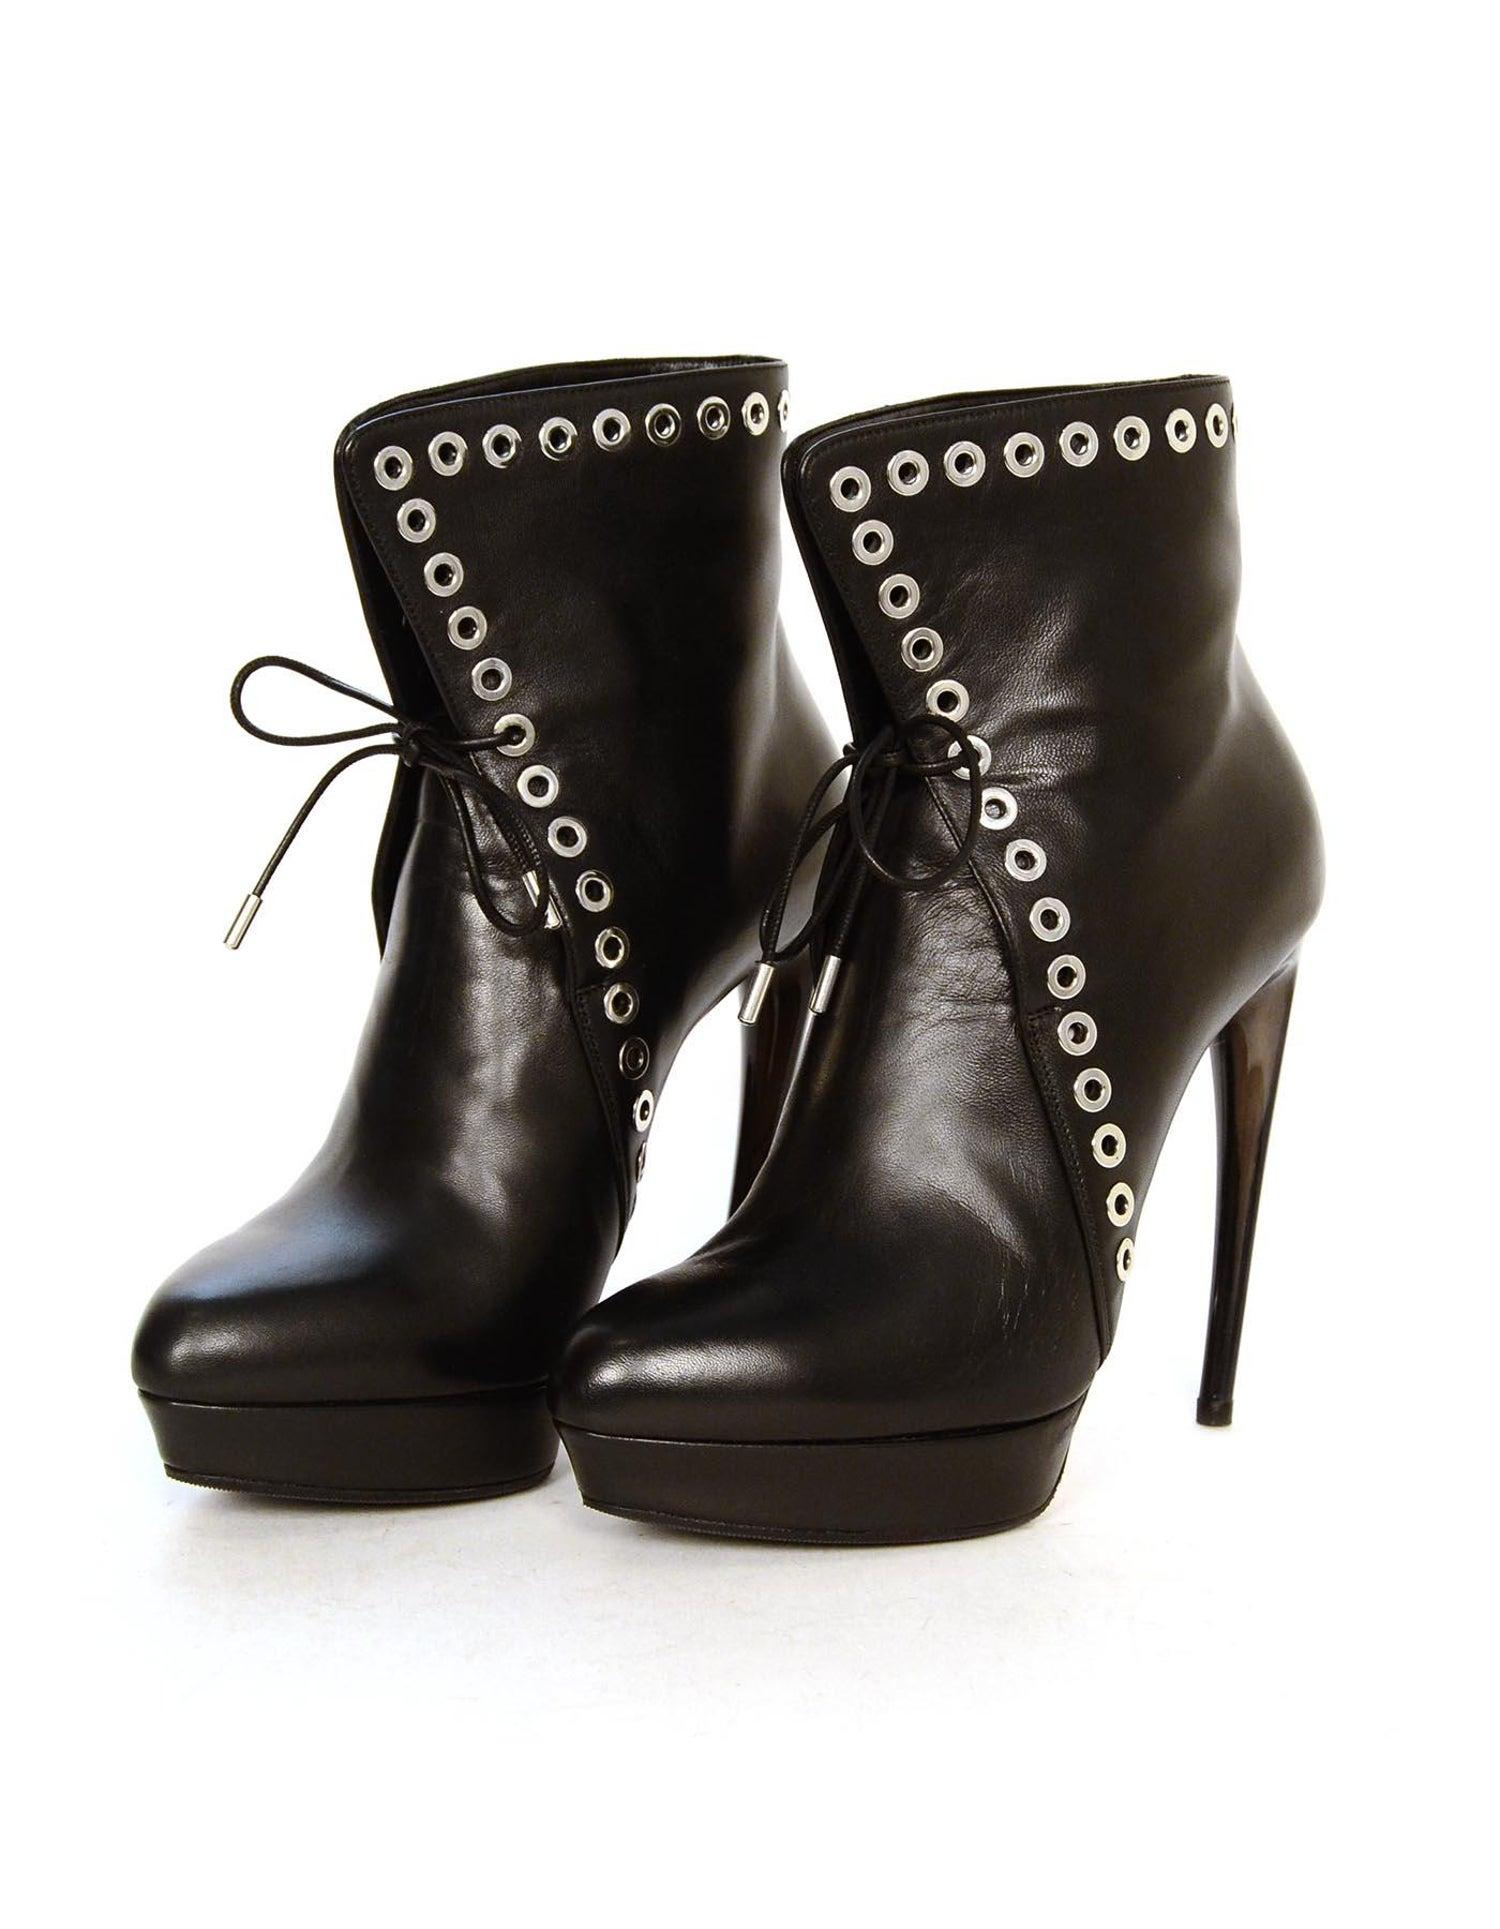 e84761e3cf3 Alexander McQueen Black Leather Silvertone Grommet Heeled Platform Boots Sz  37